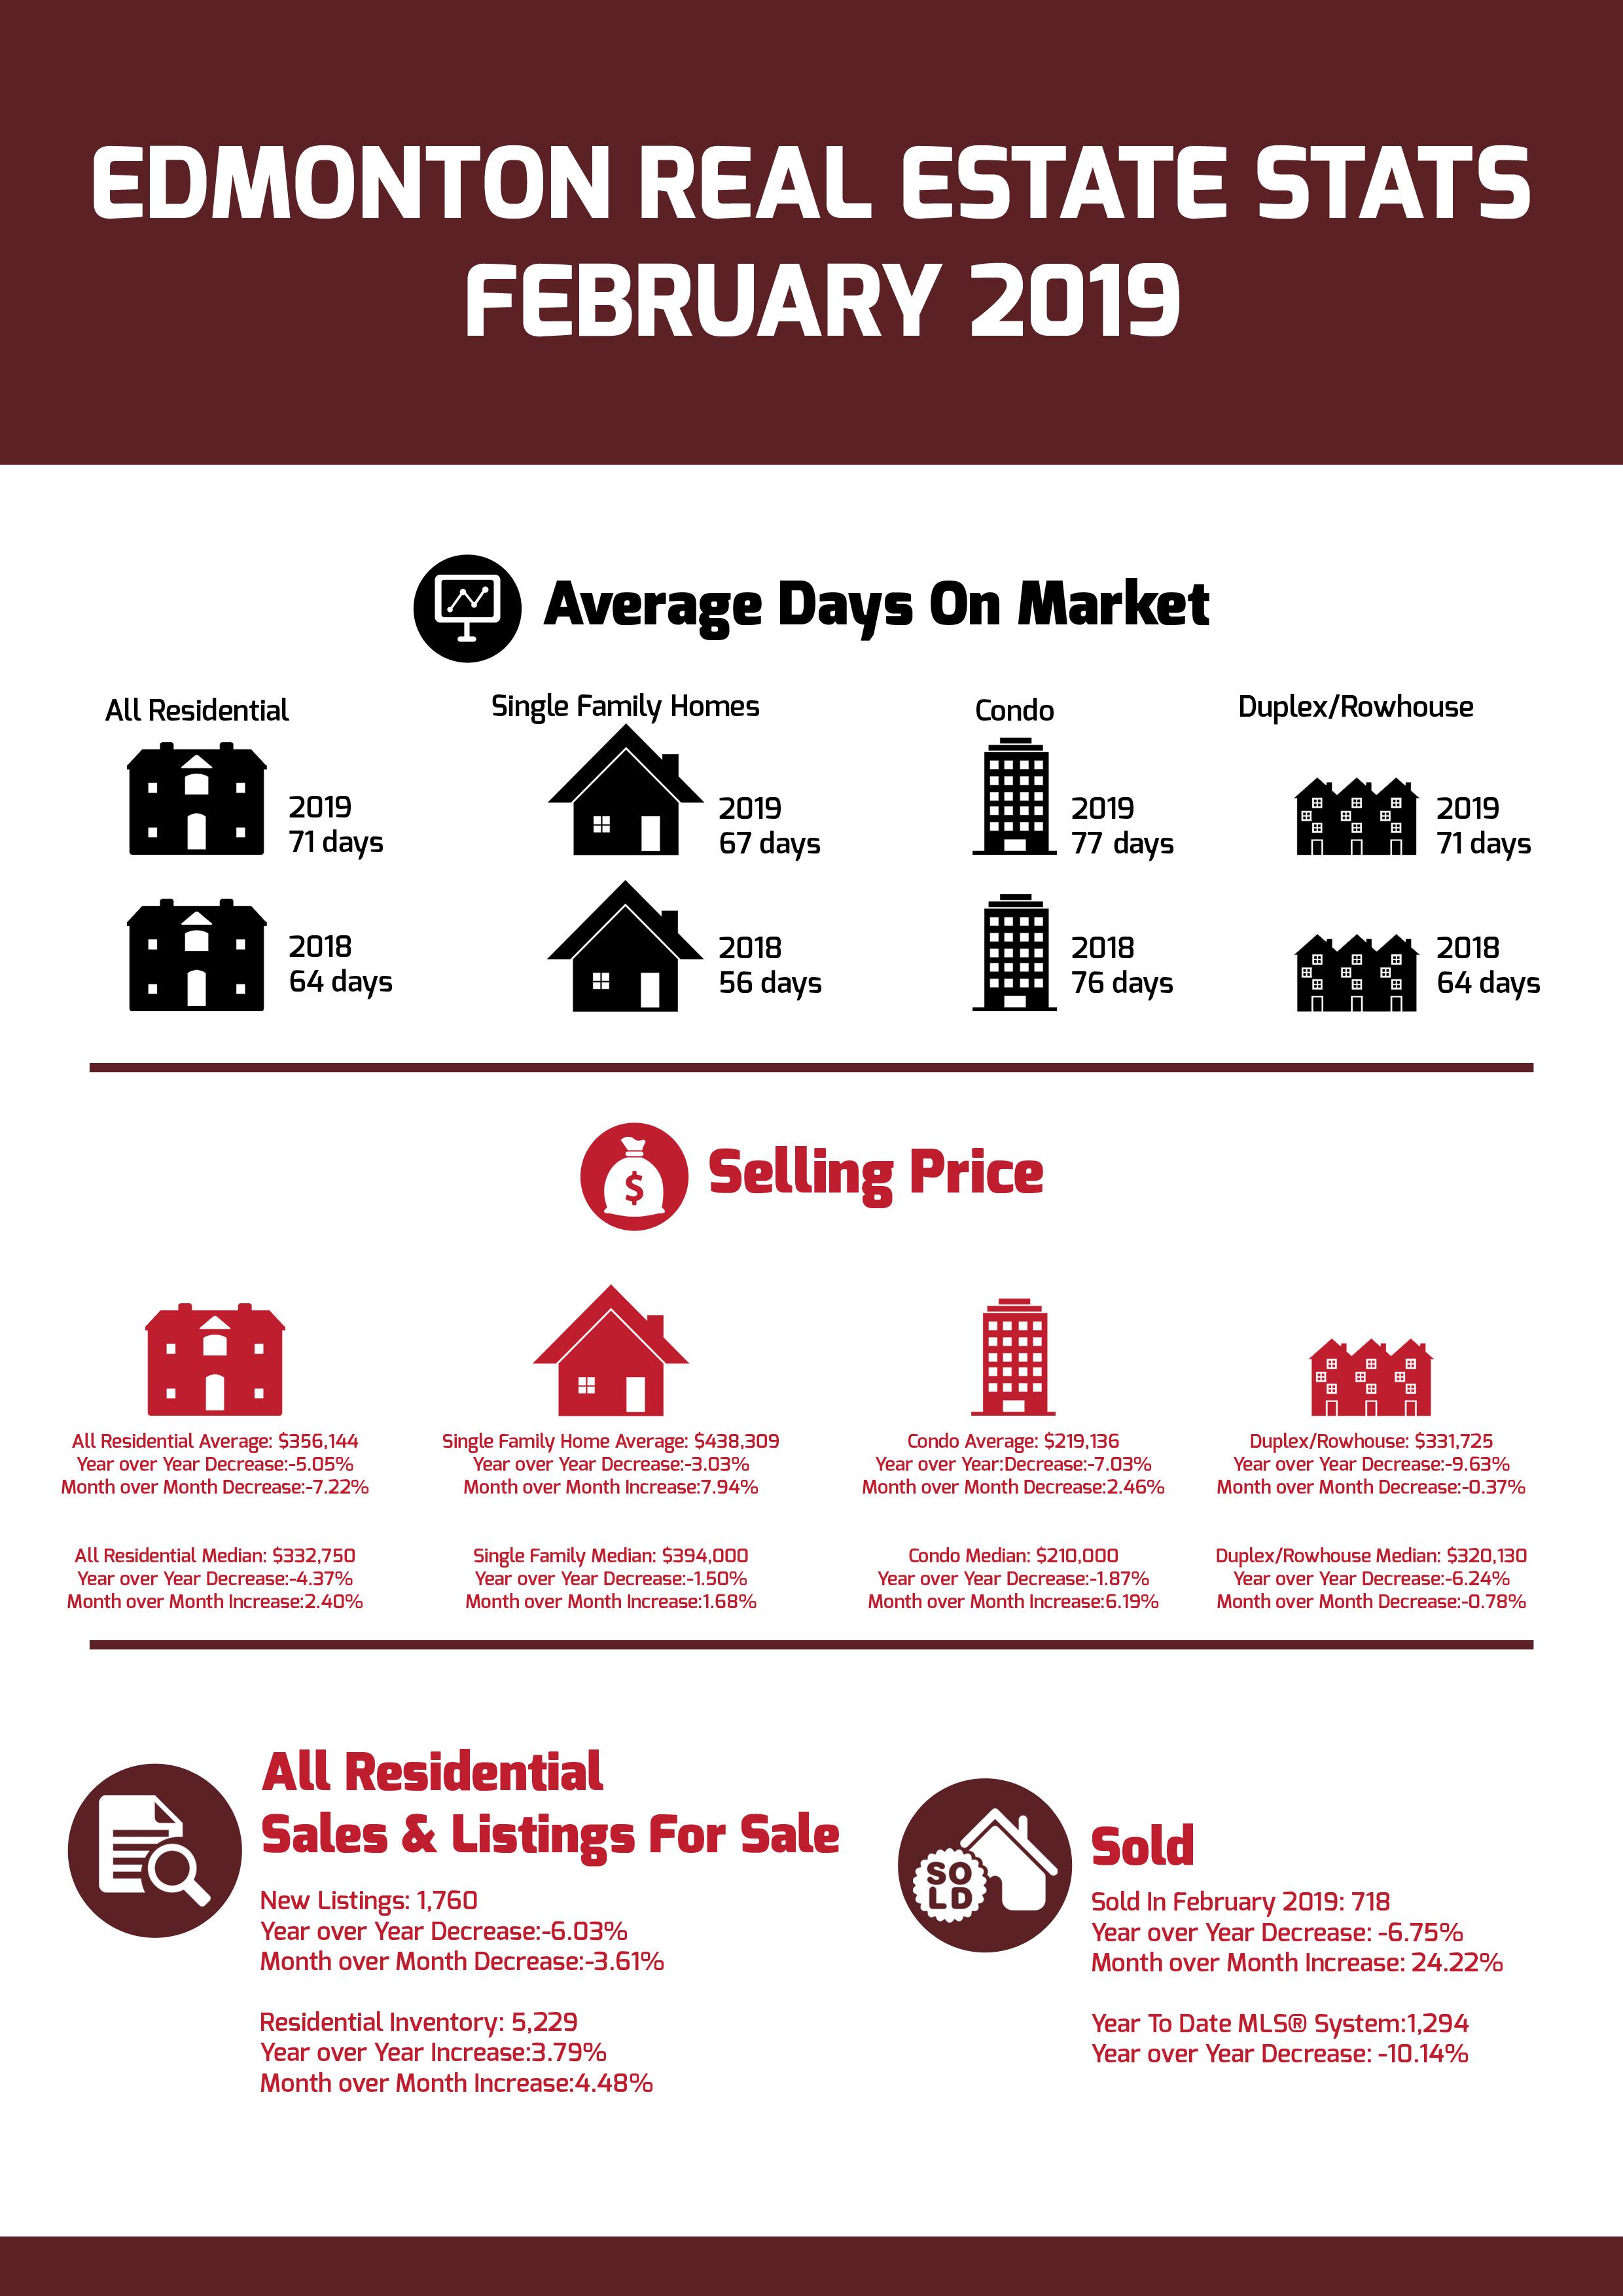 Edmonton Real Estate Stats February 2019